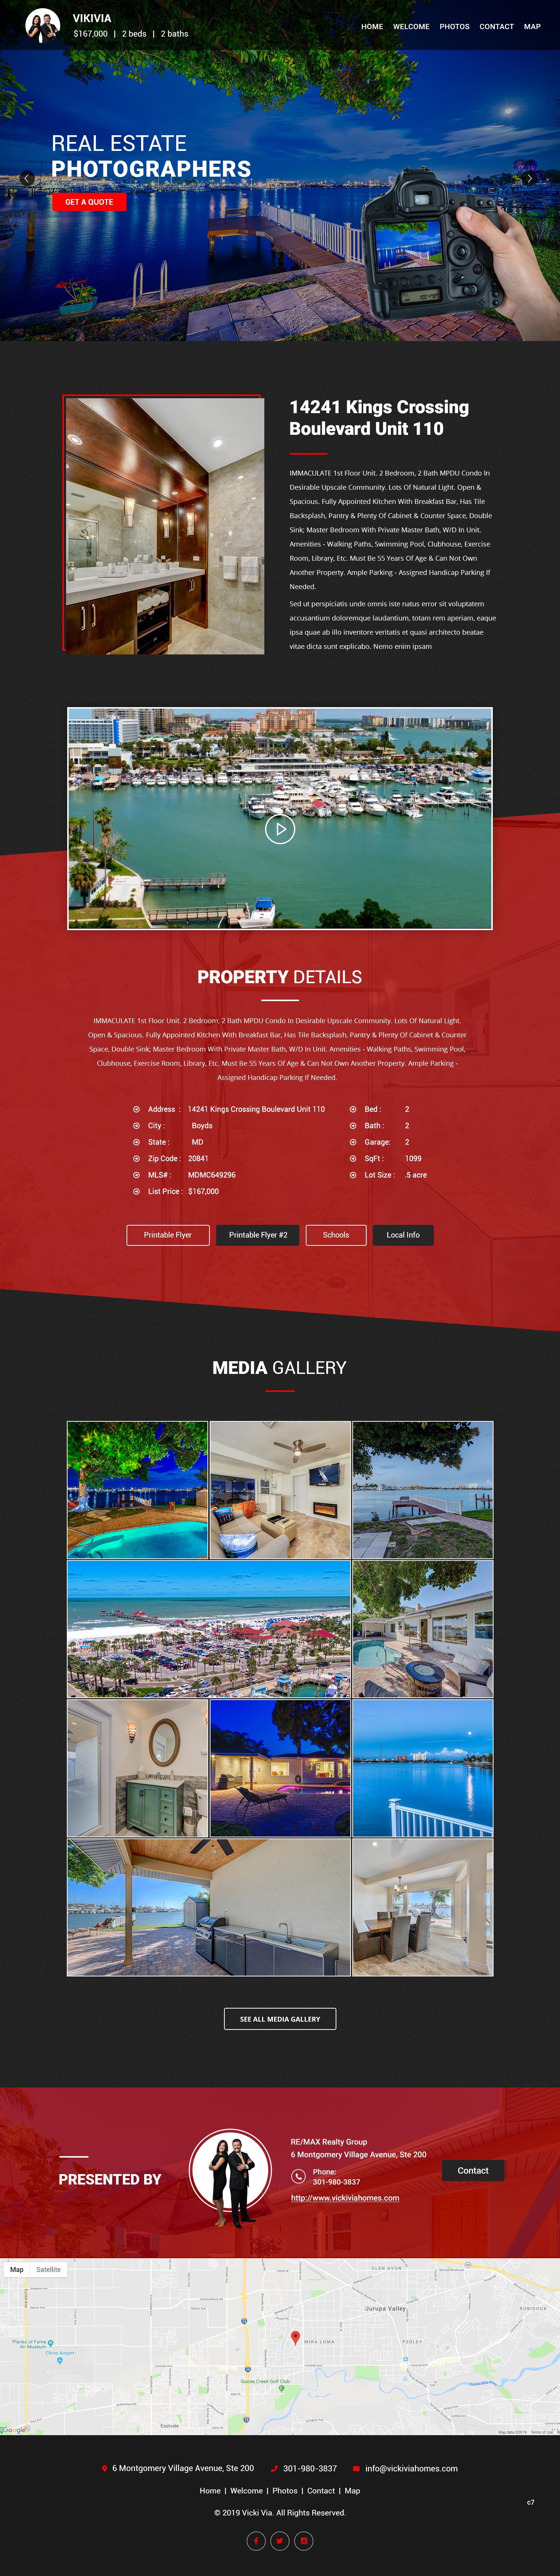 Participating Entry #12 for Website Design contest - Single Real Estate Property Listing Website Template - original